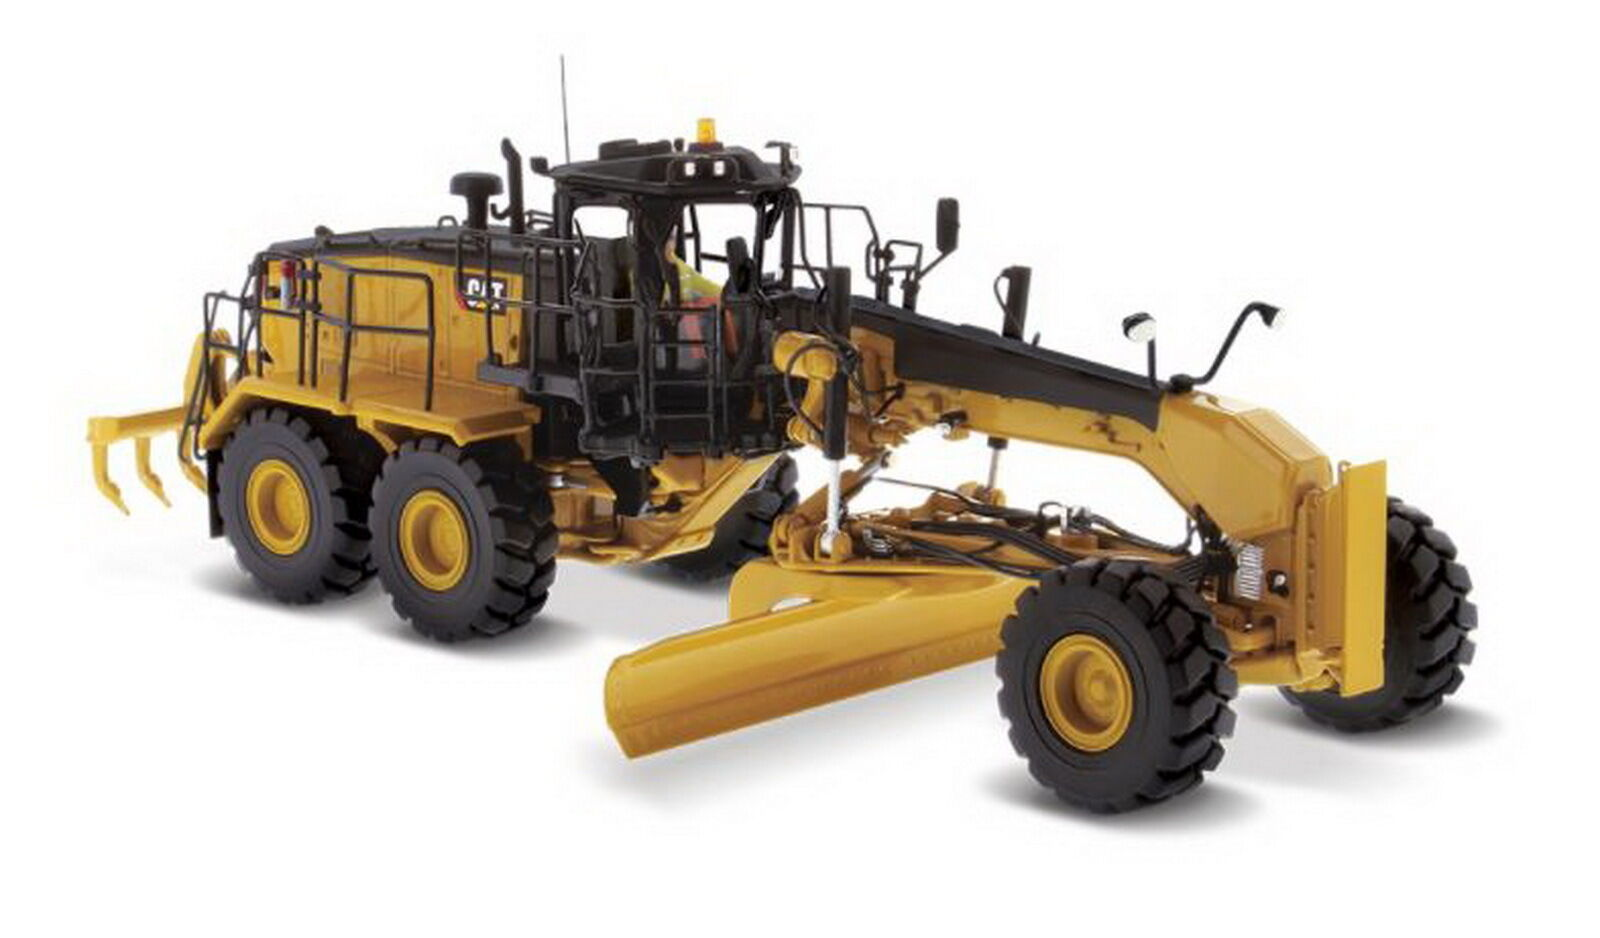 entrega rápida 1 50 dm dm dm Caterpillar Cat 18M3 Motor clasificadora Diecast Modelo  85521  perfecto